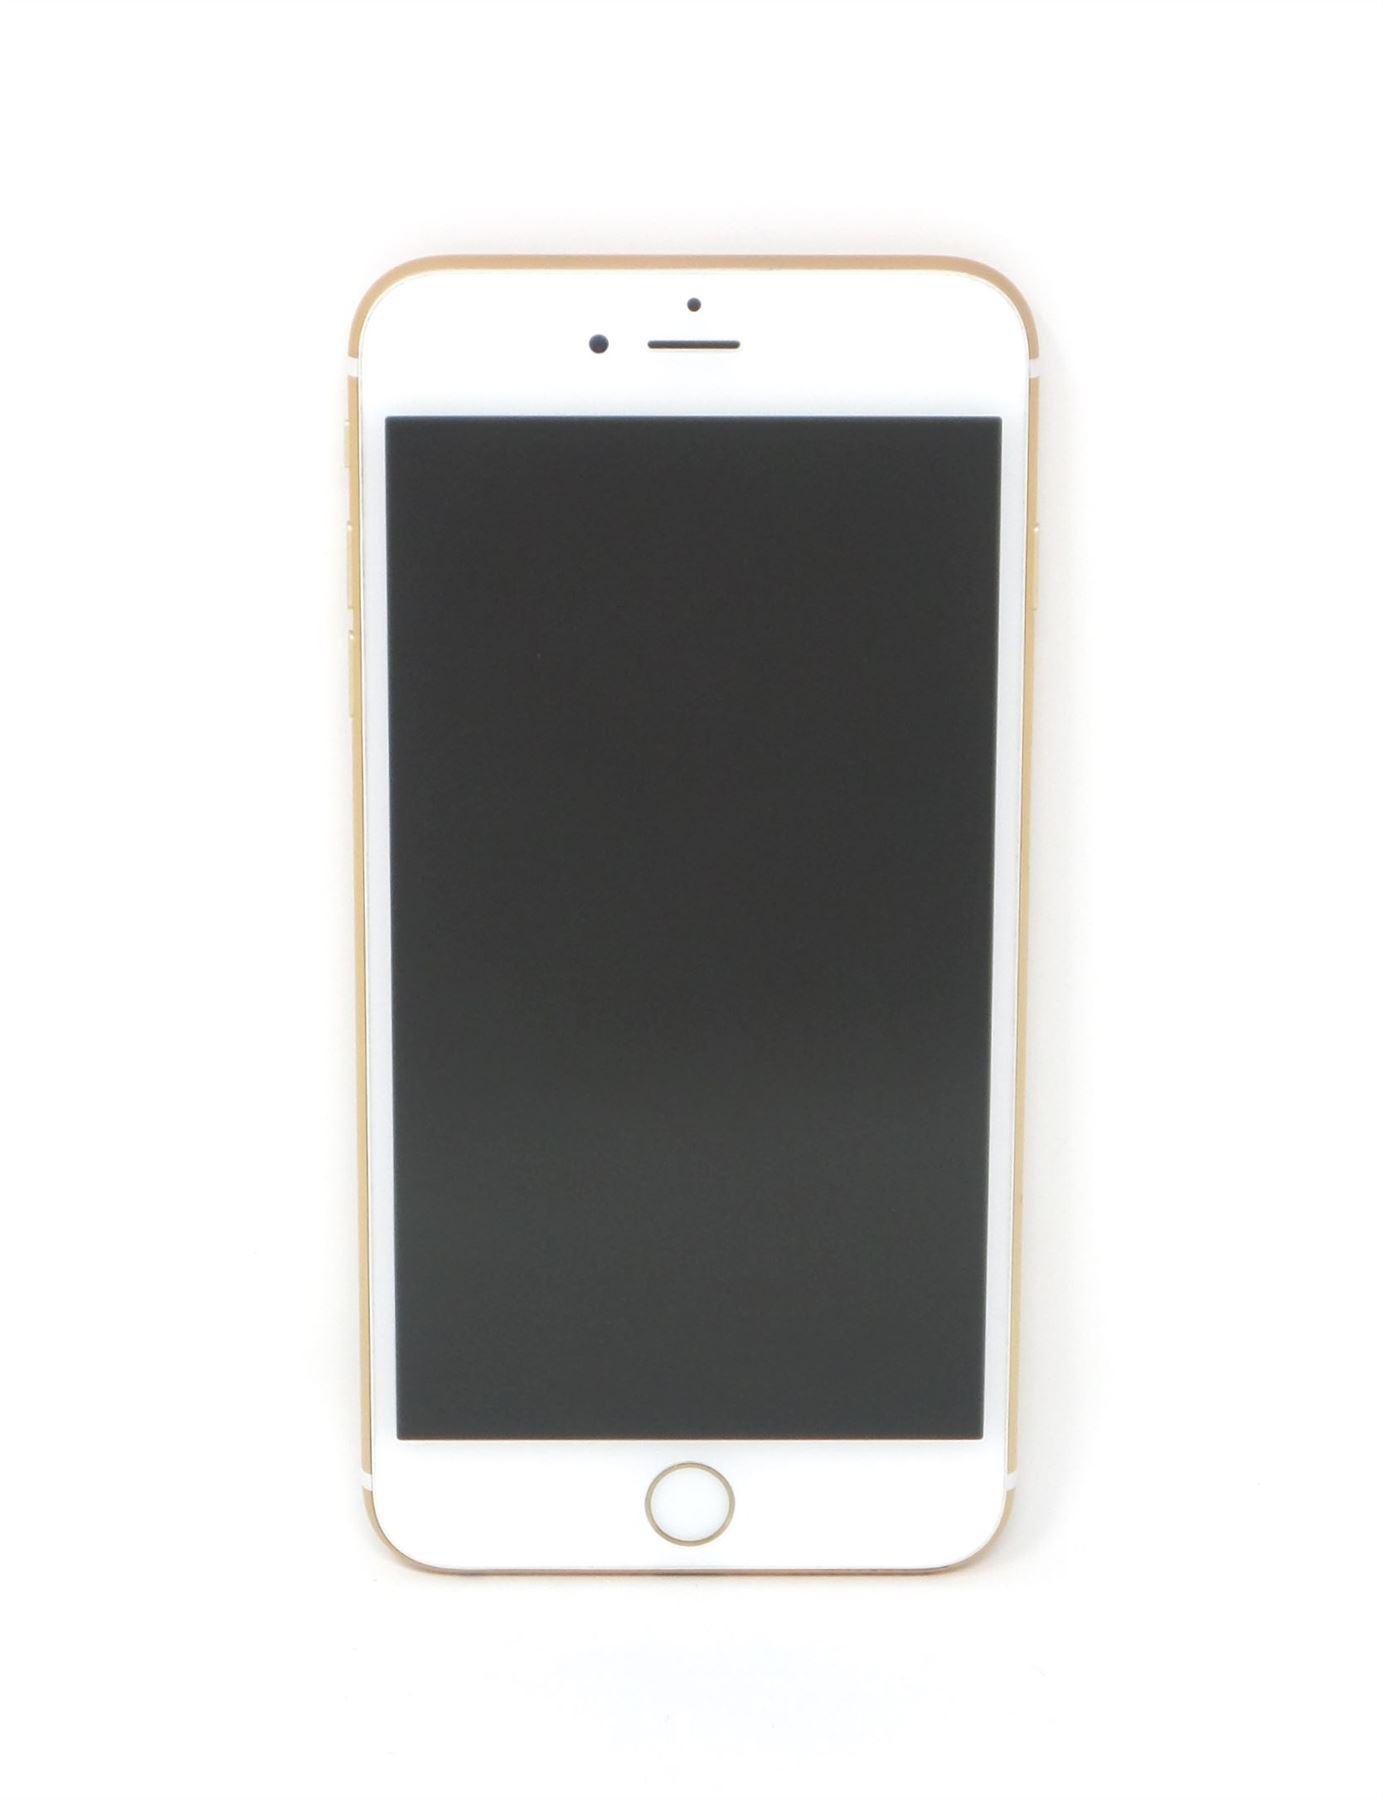 Apple-iPhone-6S-Plus-Carrier-Options-AT-amp-T-T-Mobile-Verizon-Unlocked-16-64-128GB thumbnail 9